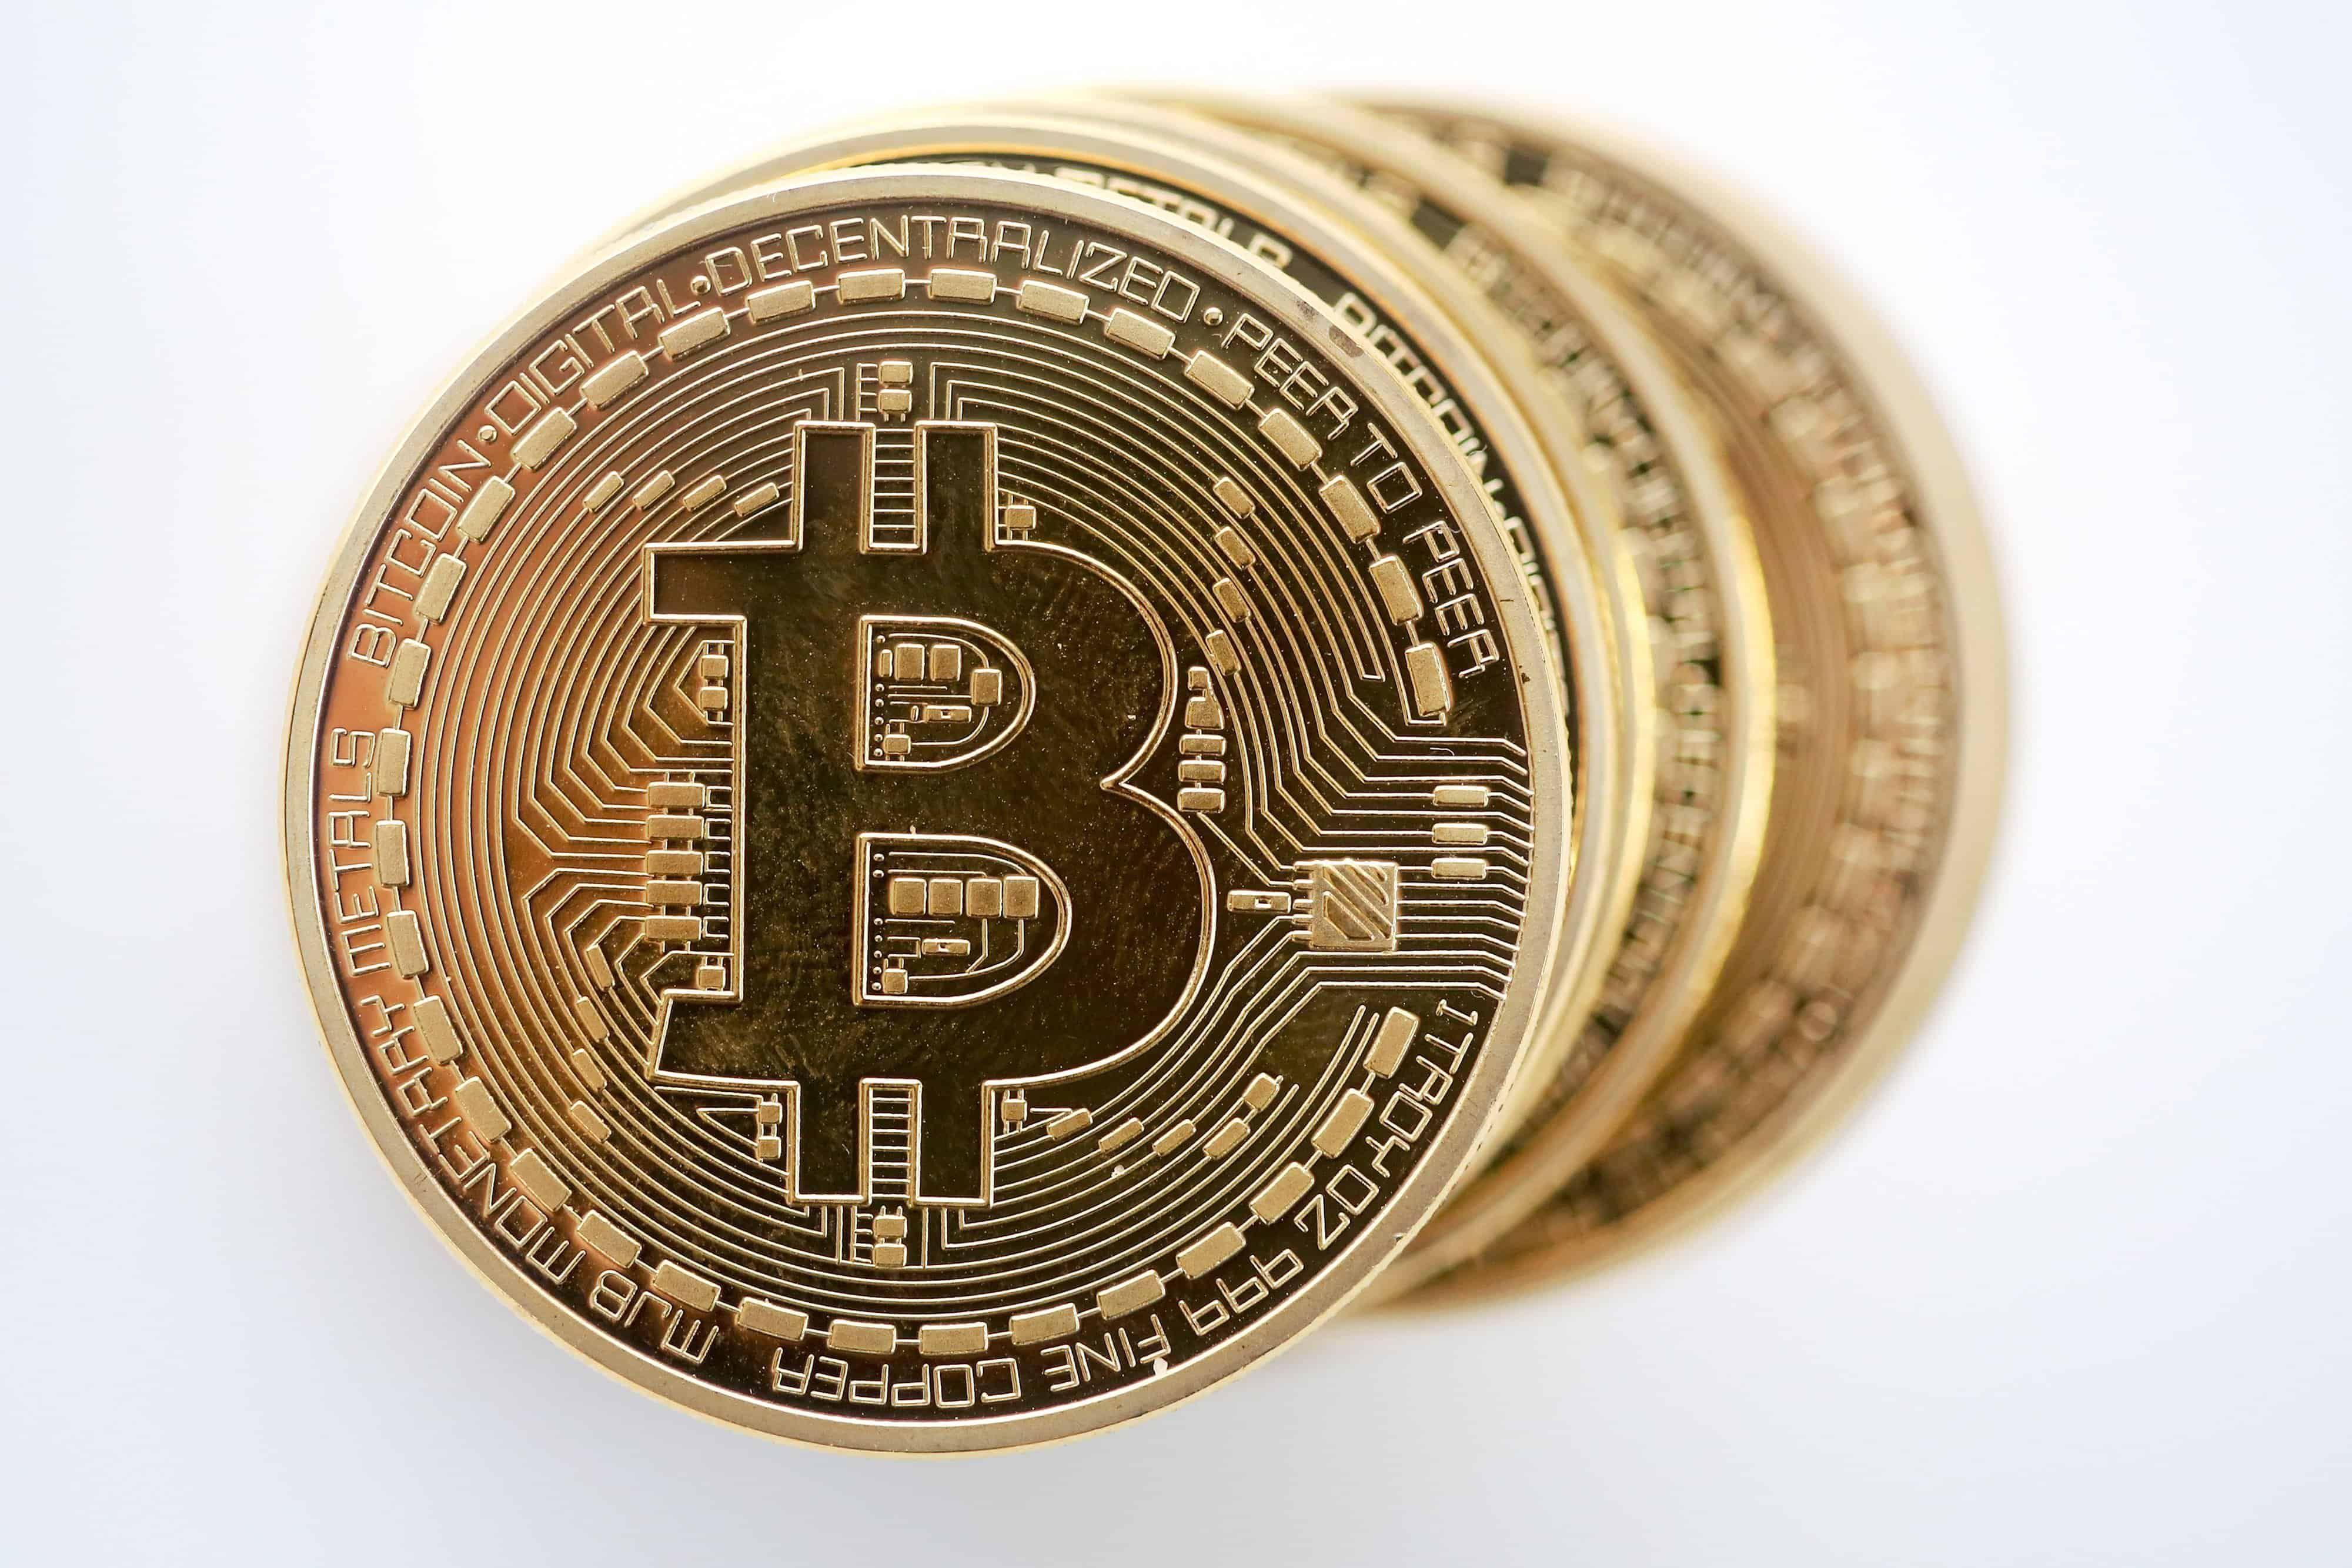 outlet btc bitcoin software de comercializare erfahruengen